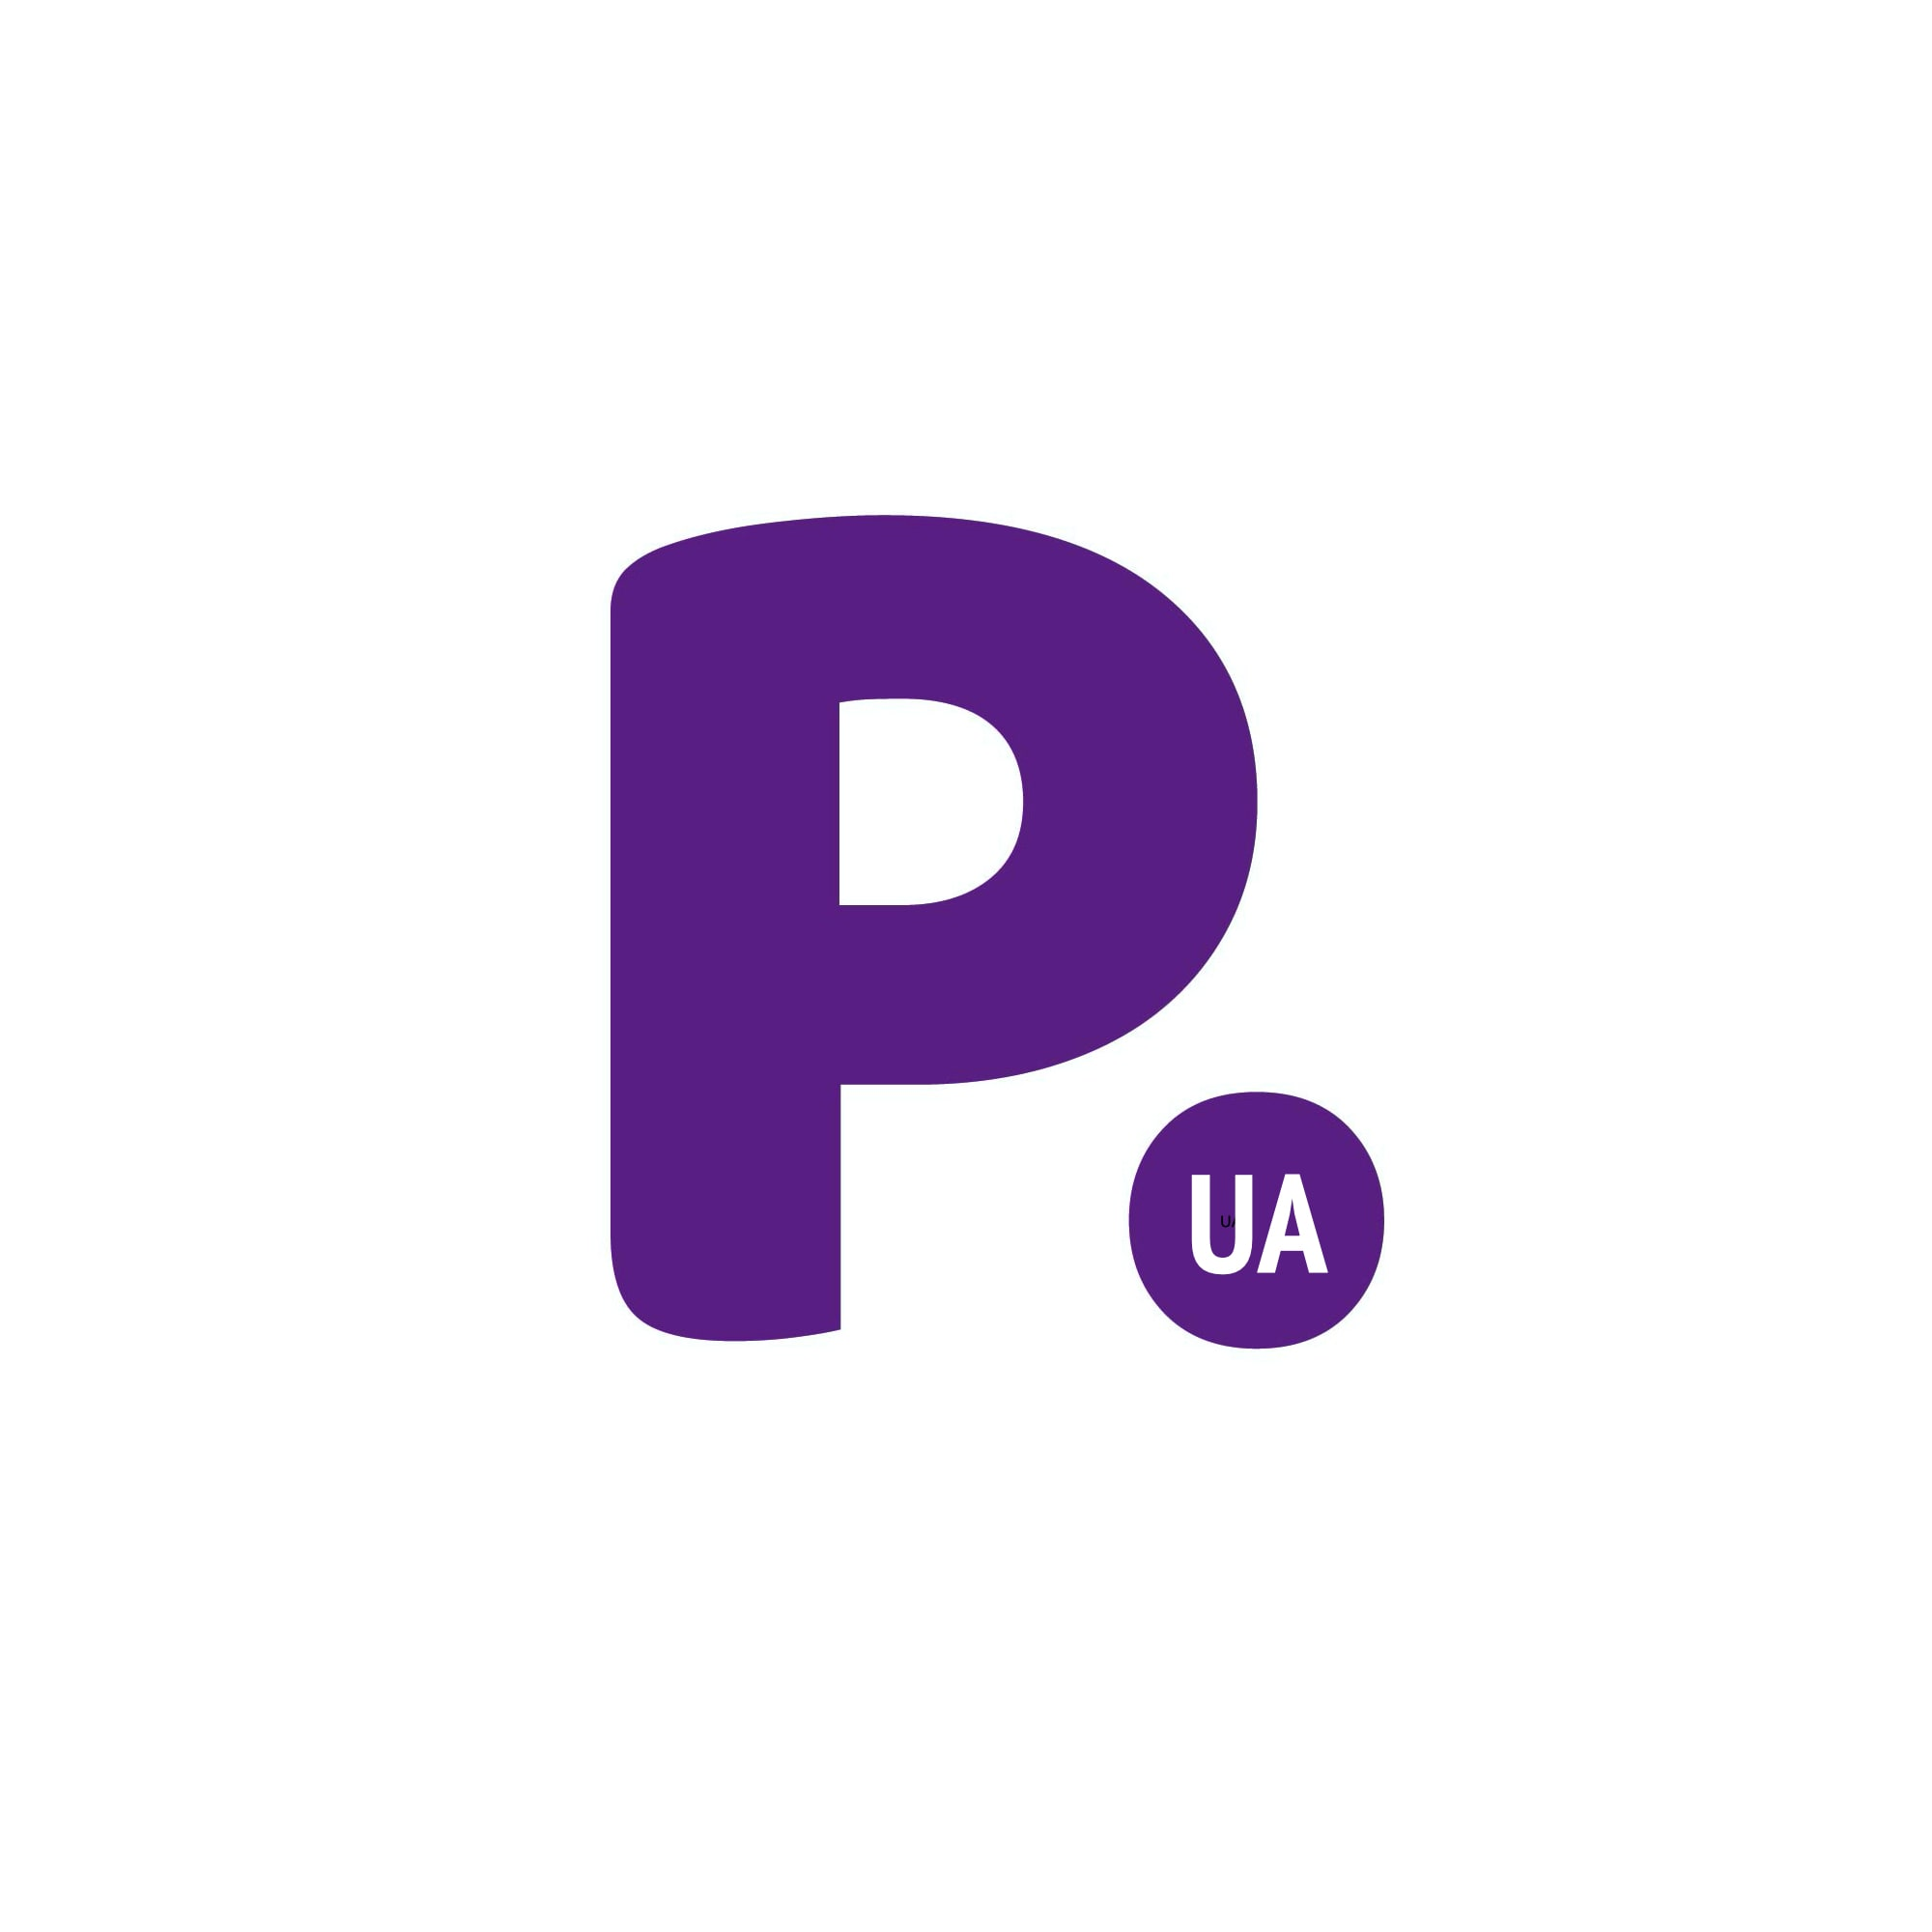 "Жесткий диск WD 3.5"" SATA 3.0 1TB 5400 64MB Purple Surveillance (WD10PURZ)"